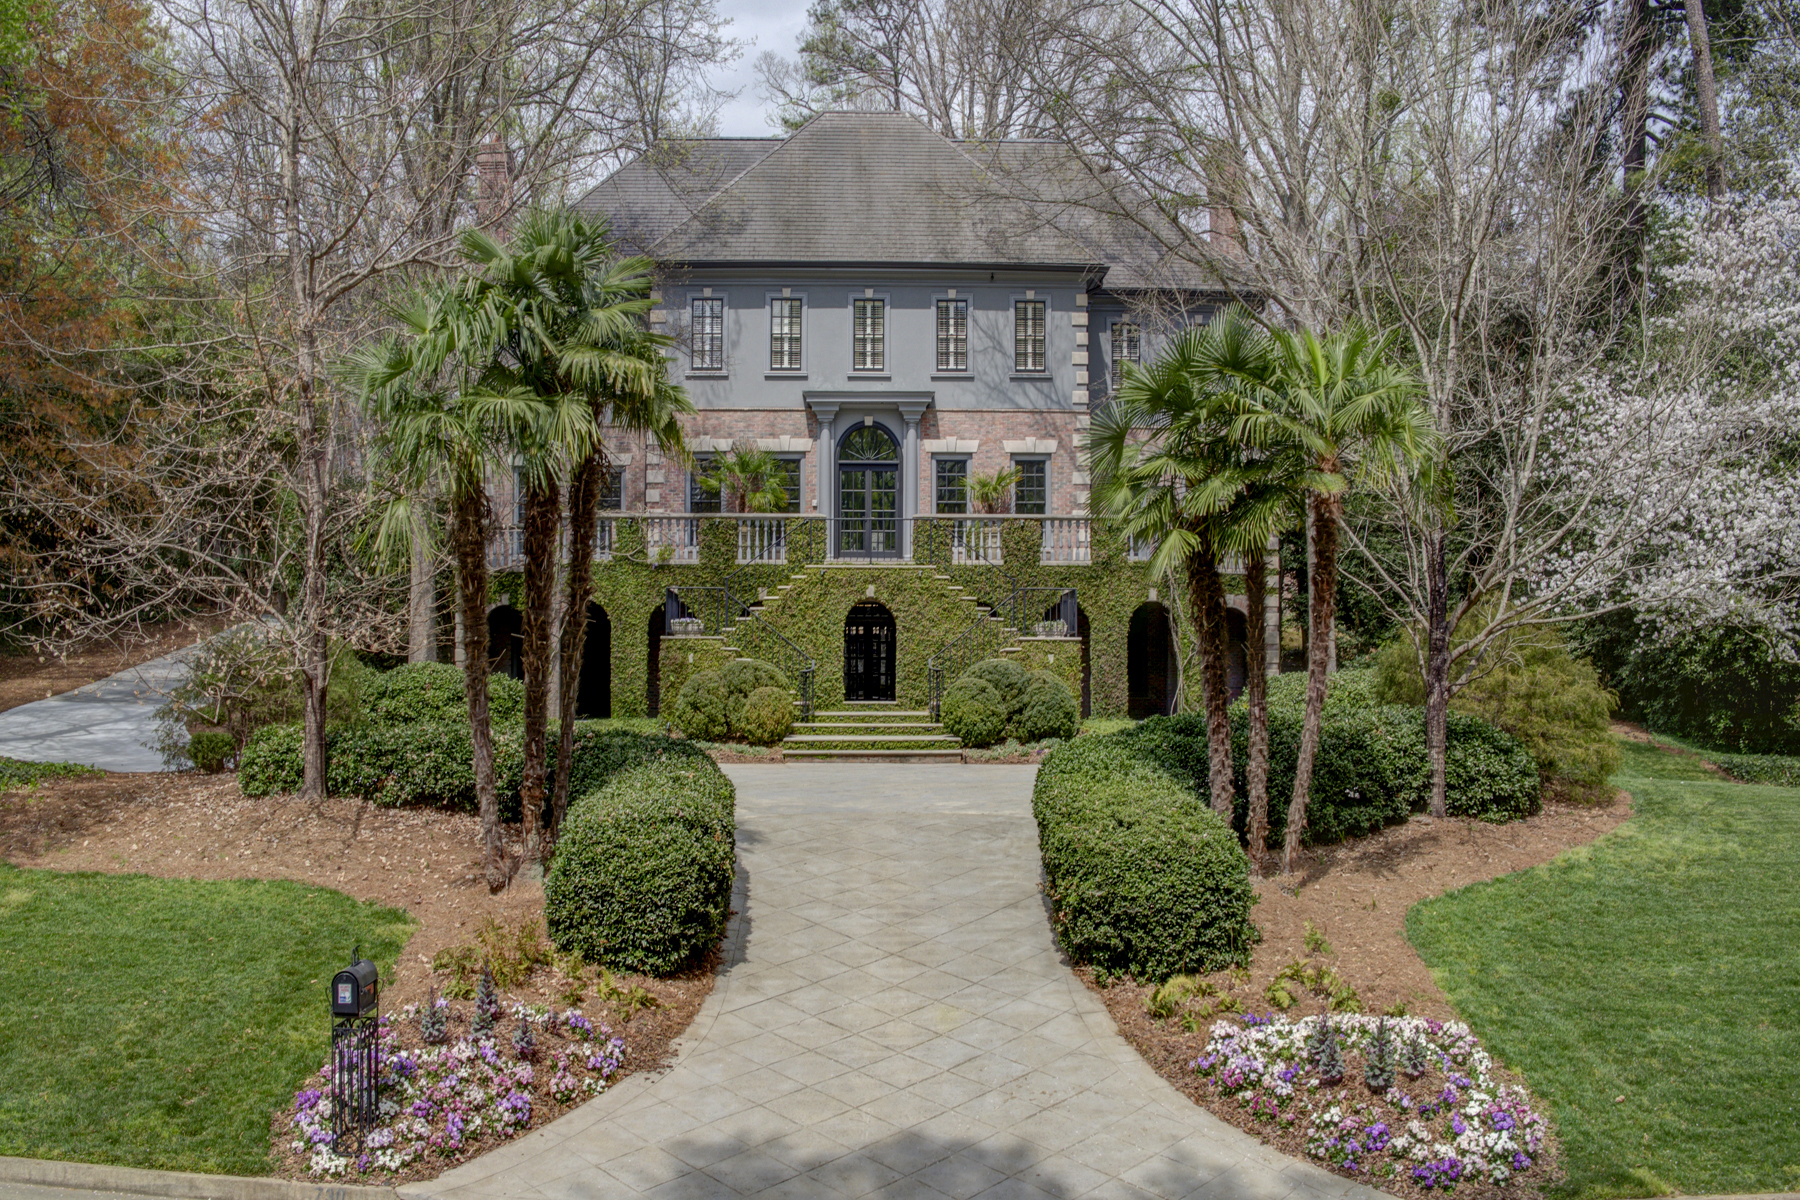 Villa per Vendita alle ore Captivating Estate With Exquisite Detail Throughout 730 Conway Glen Drive NW Buckhead, Atlanta, Georgia, 30327 Stati Uniti